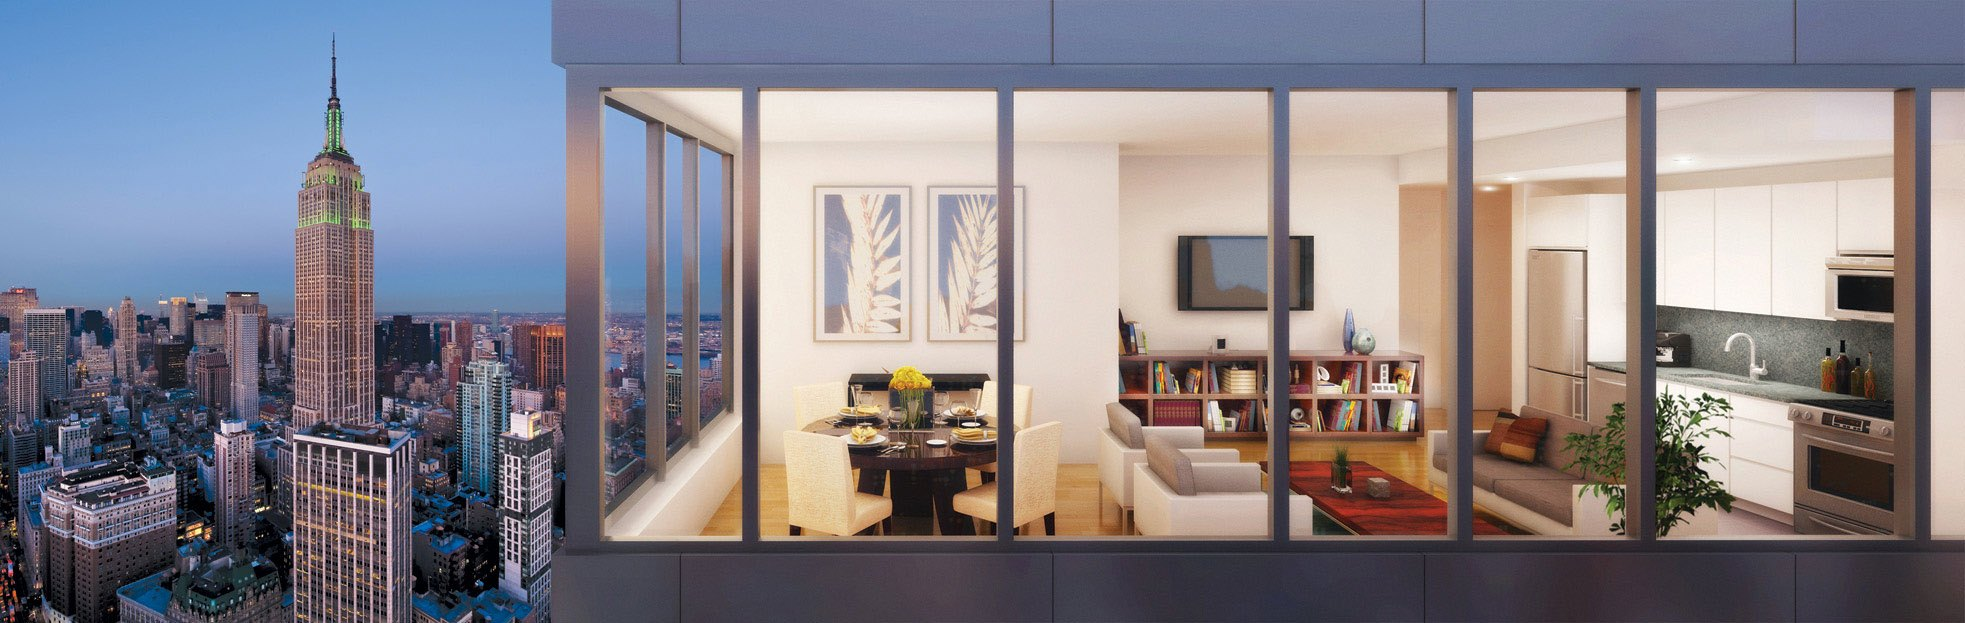 Beatrice Living Room